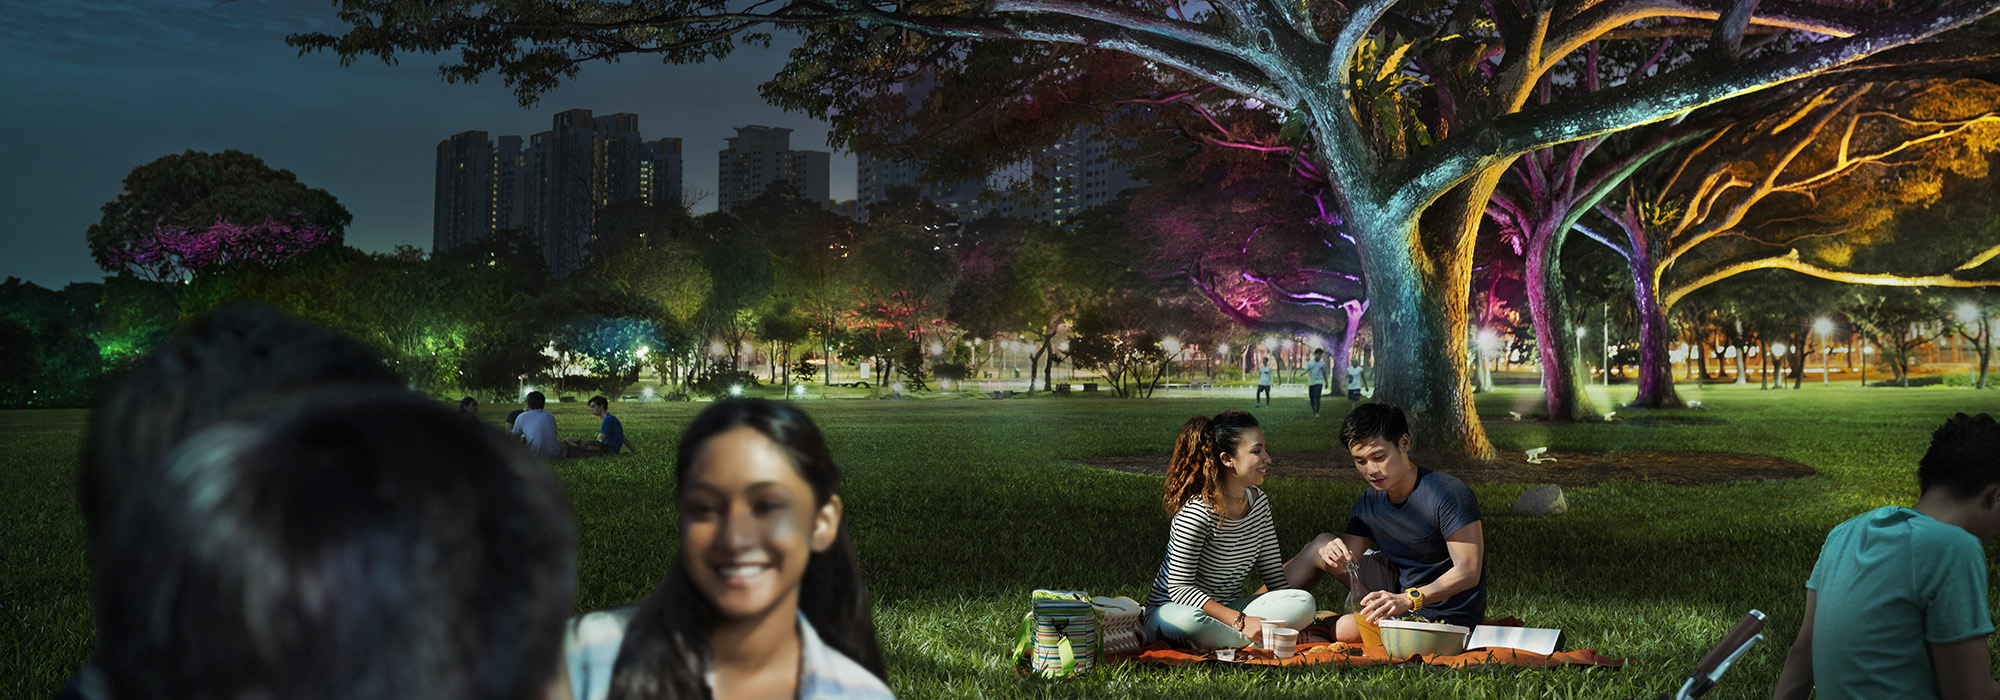 philips lighting launches new sustainability program 2016 2020